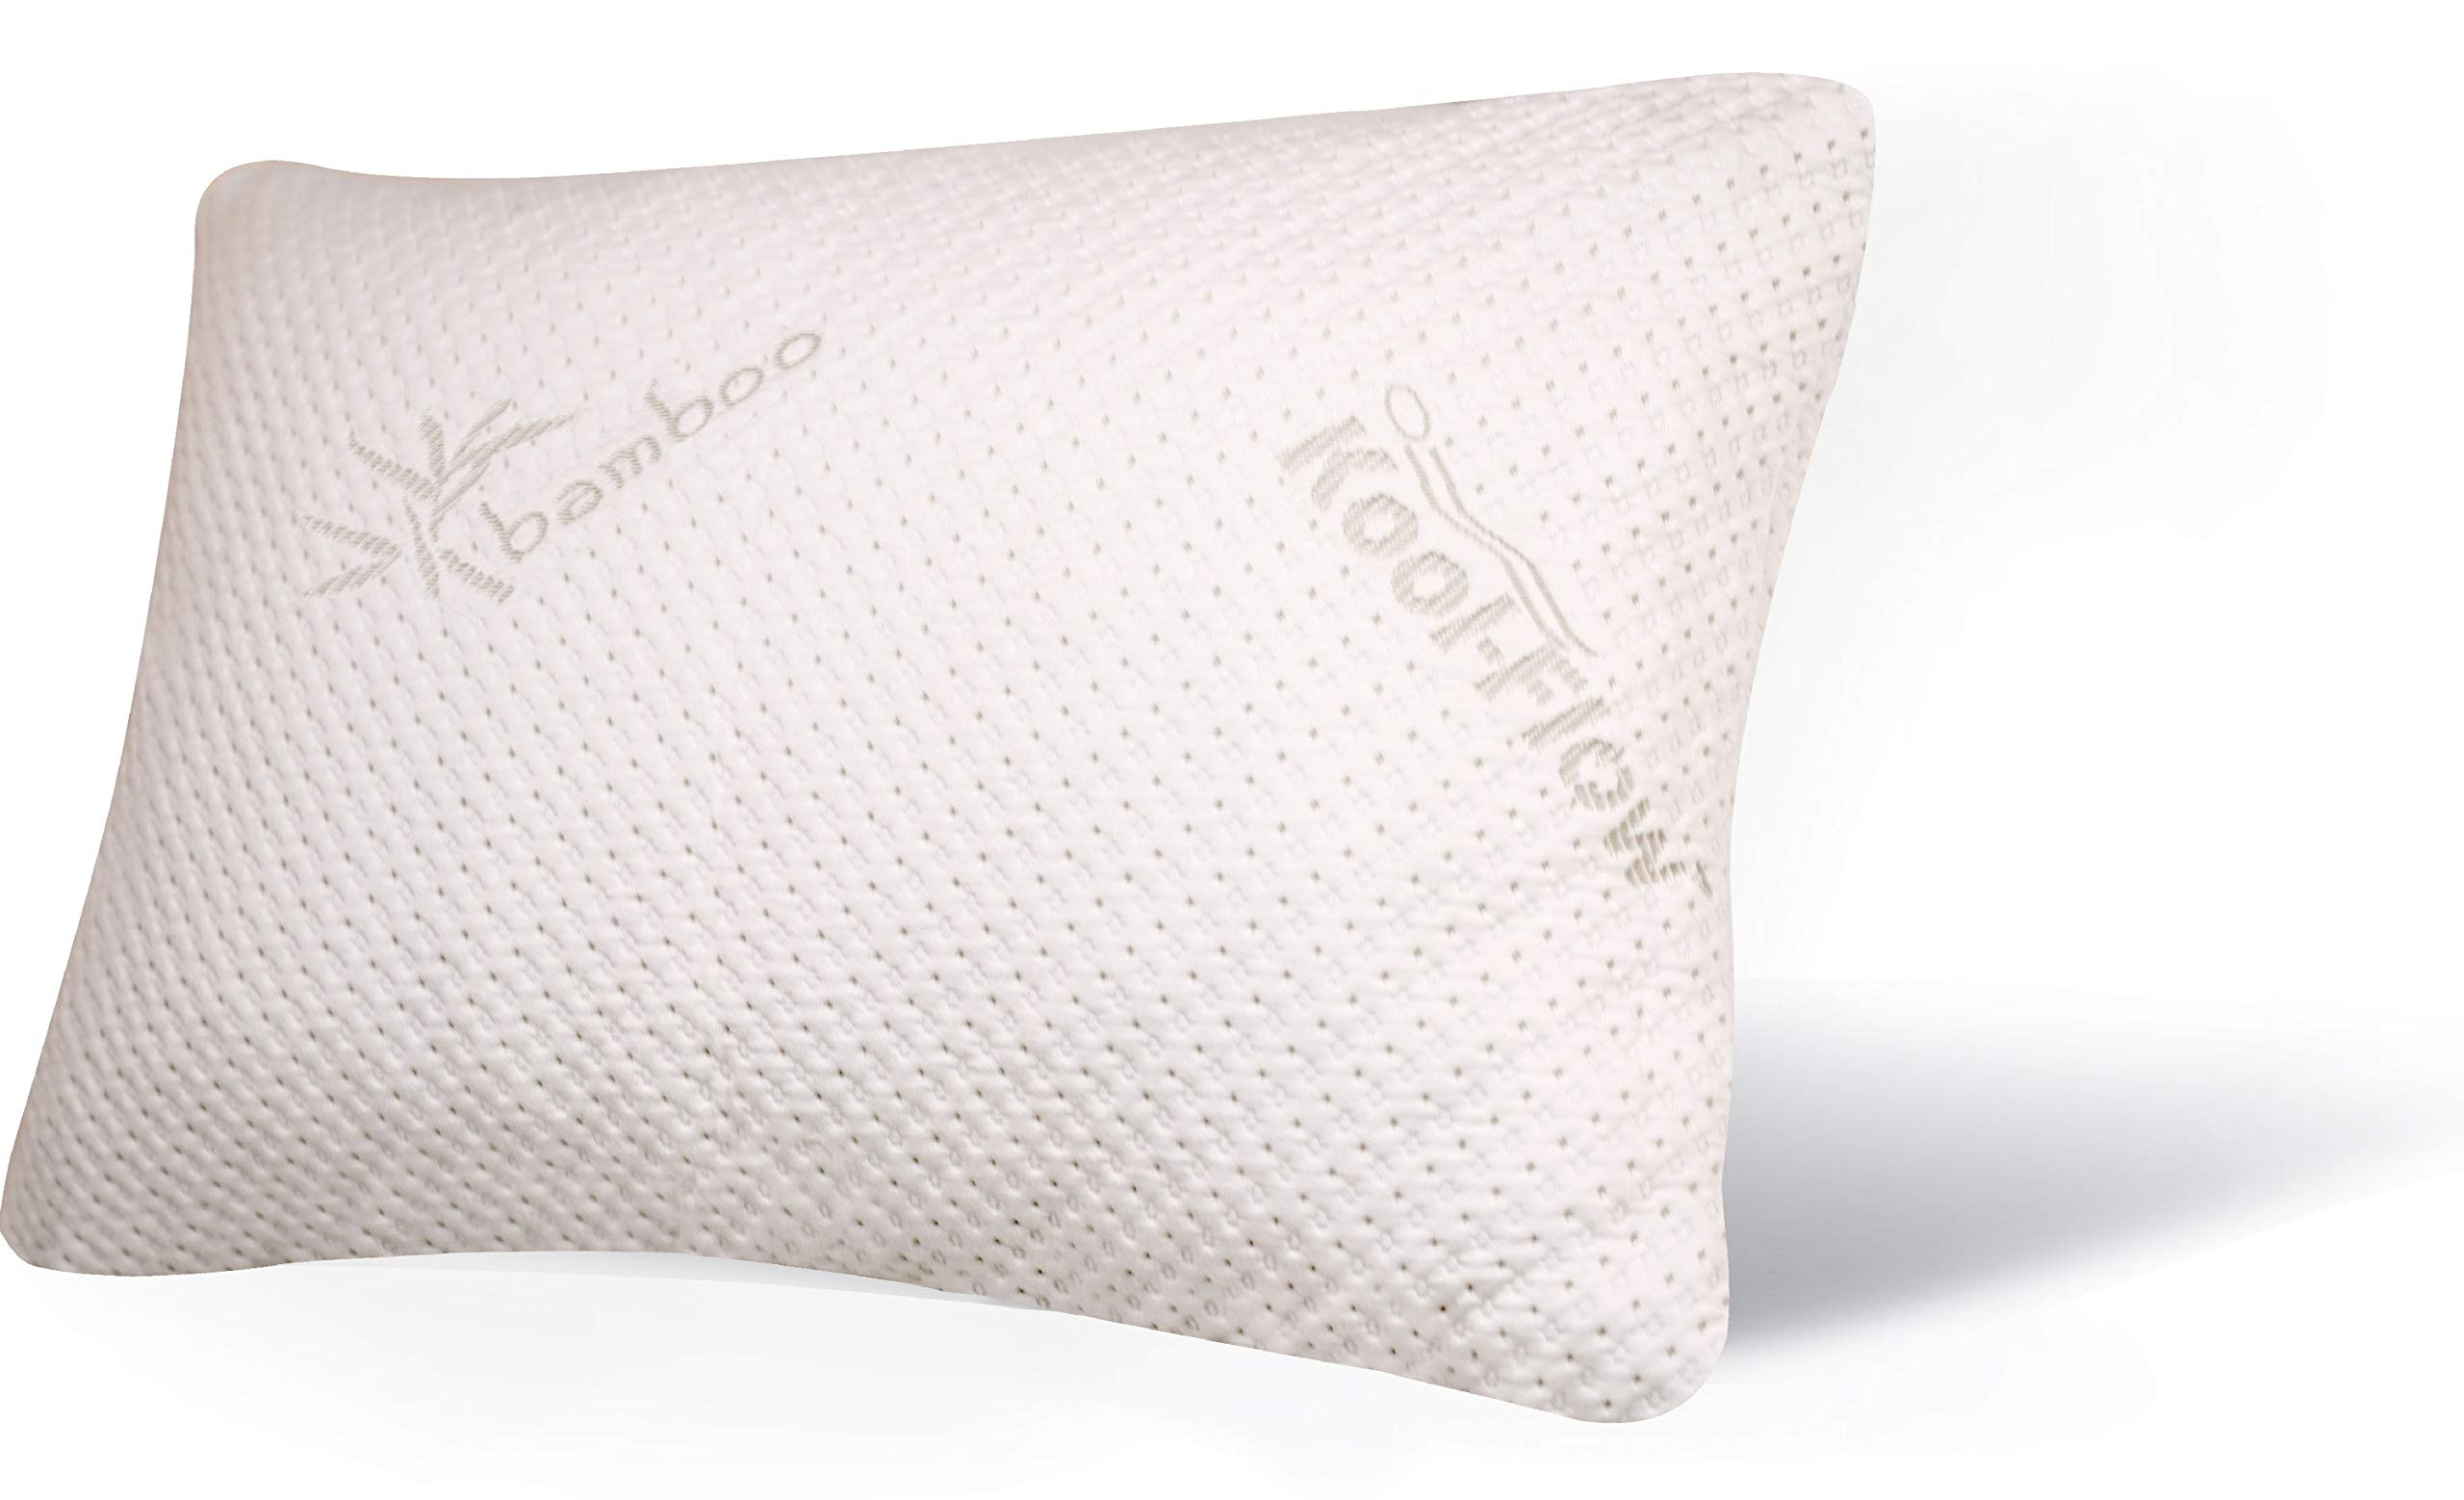 Snuggle Pedic Ultra Luxury Combination Breathable Hypoallergenic